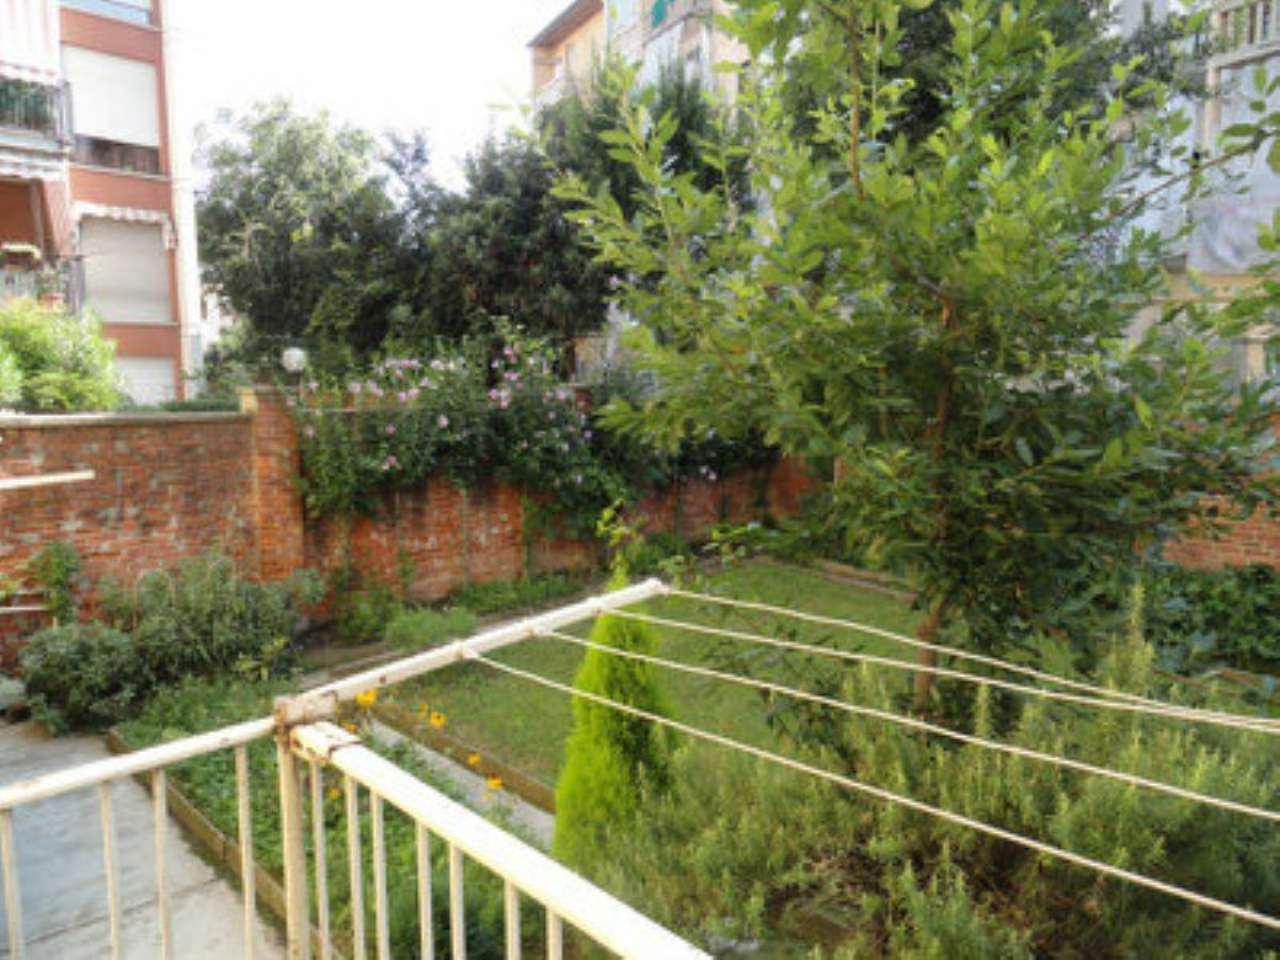 Bilocale Torino Via Verolengo 194 8